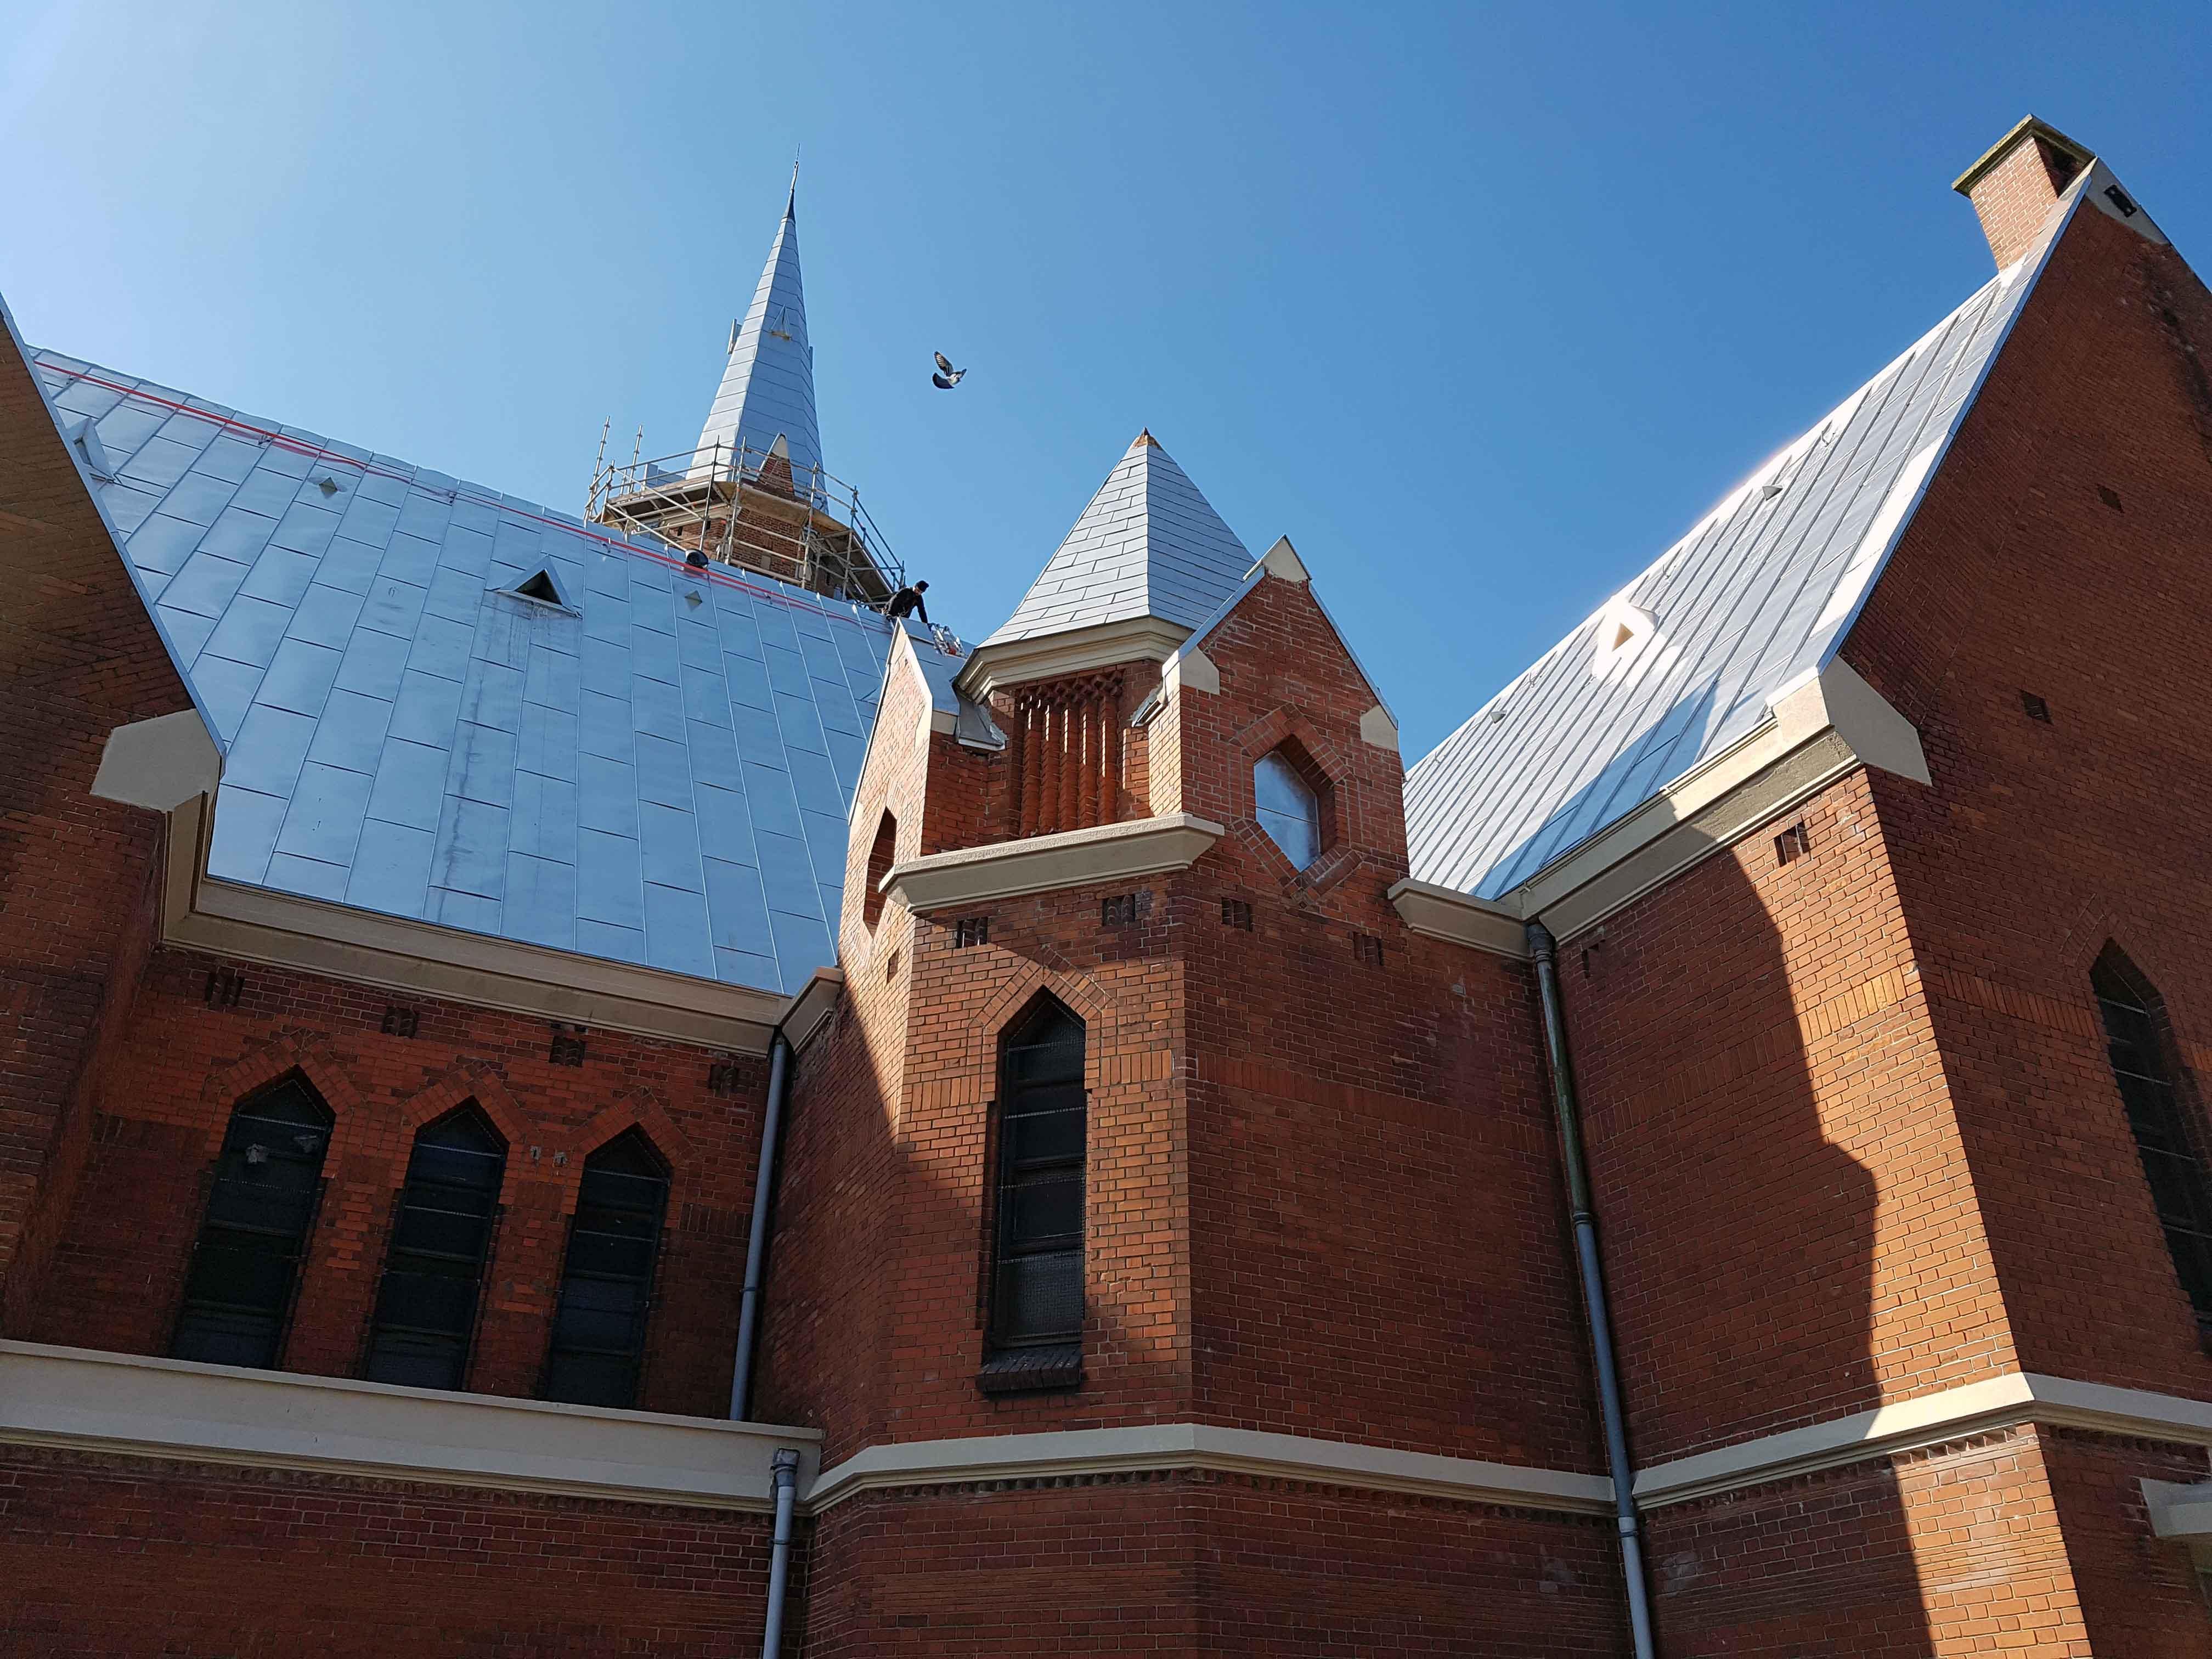 Eglise du Coeur Immaculé 12